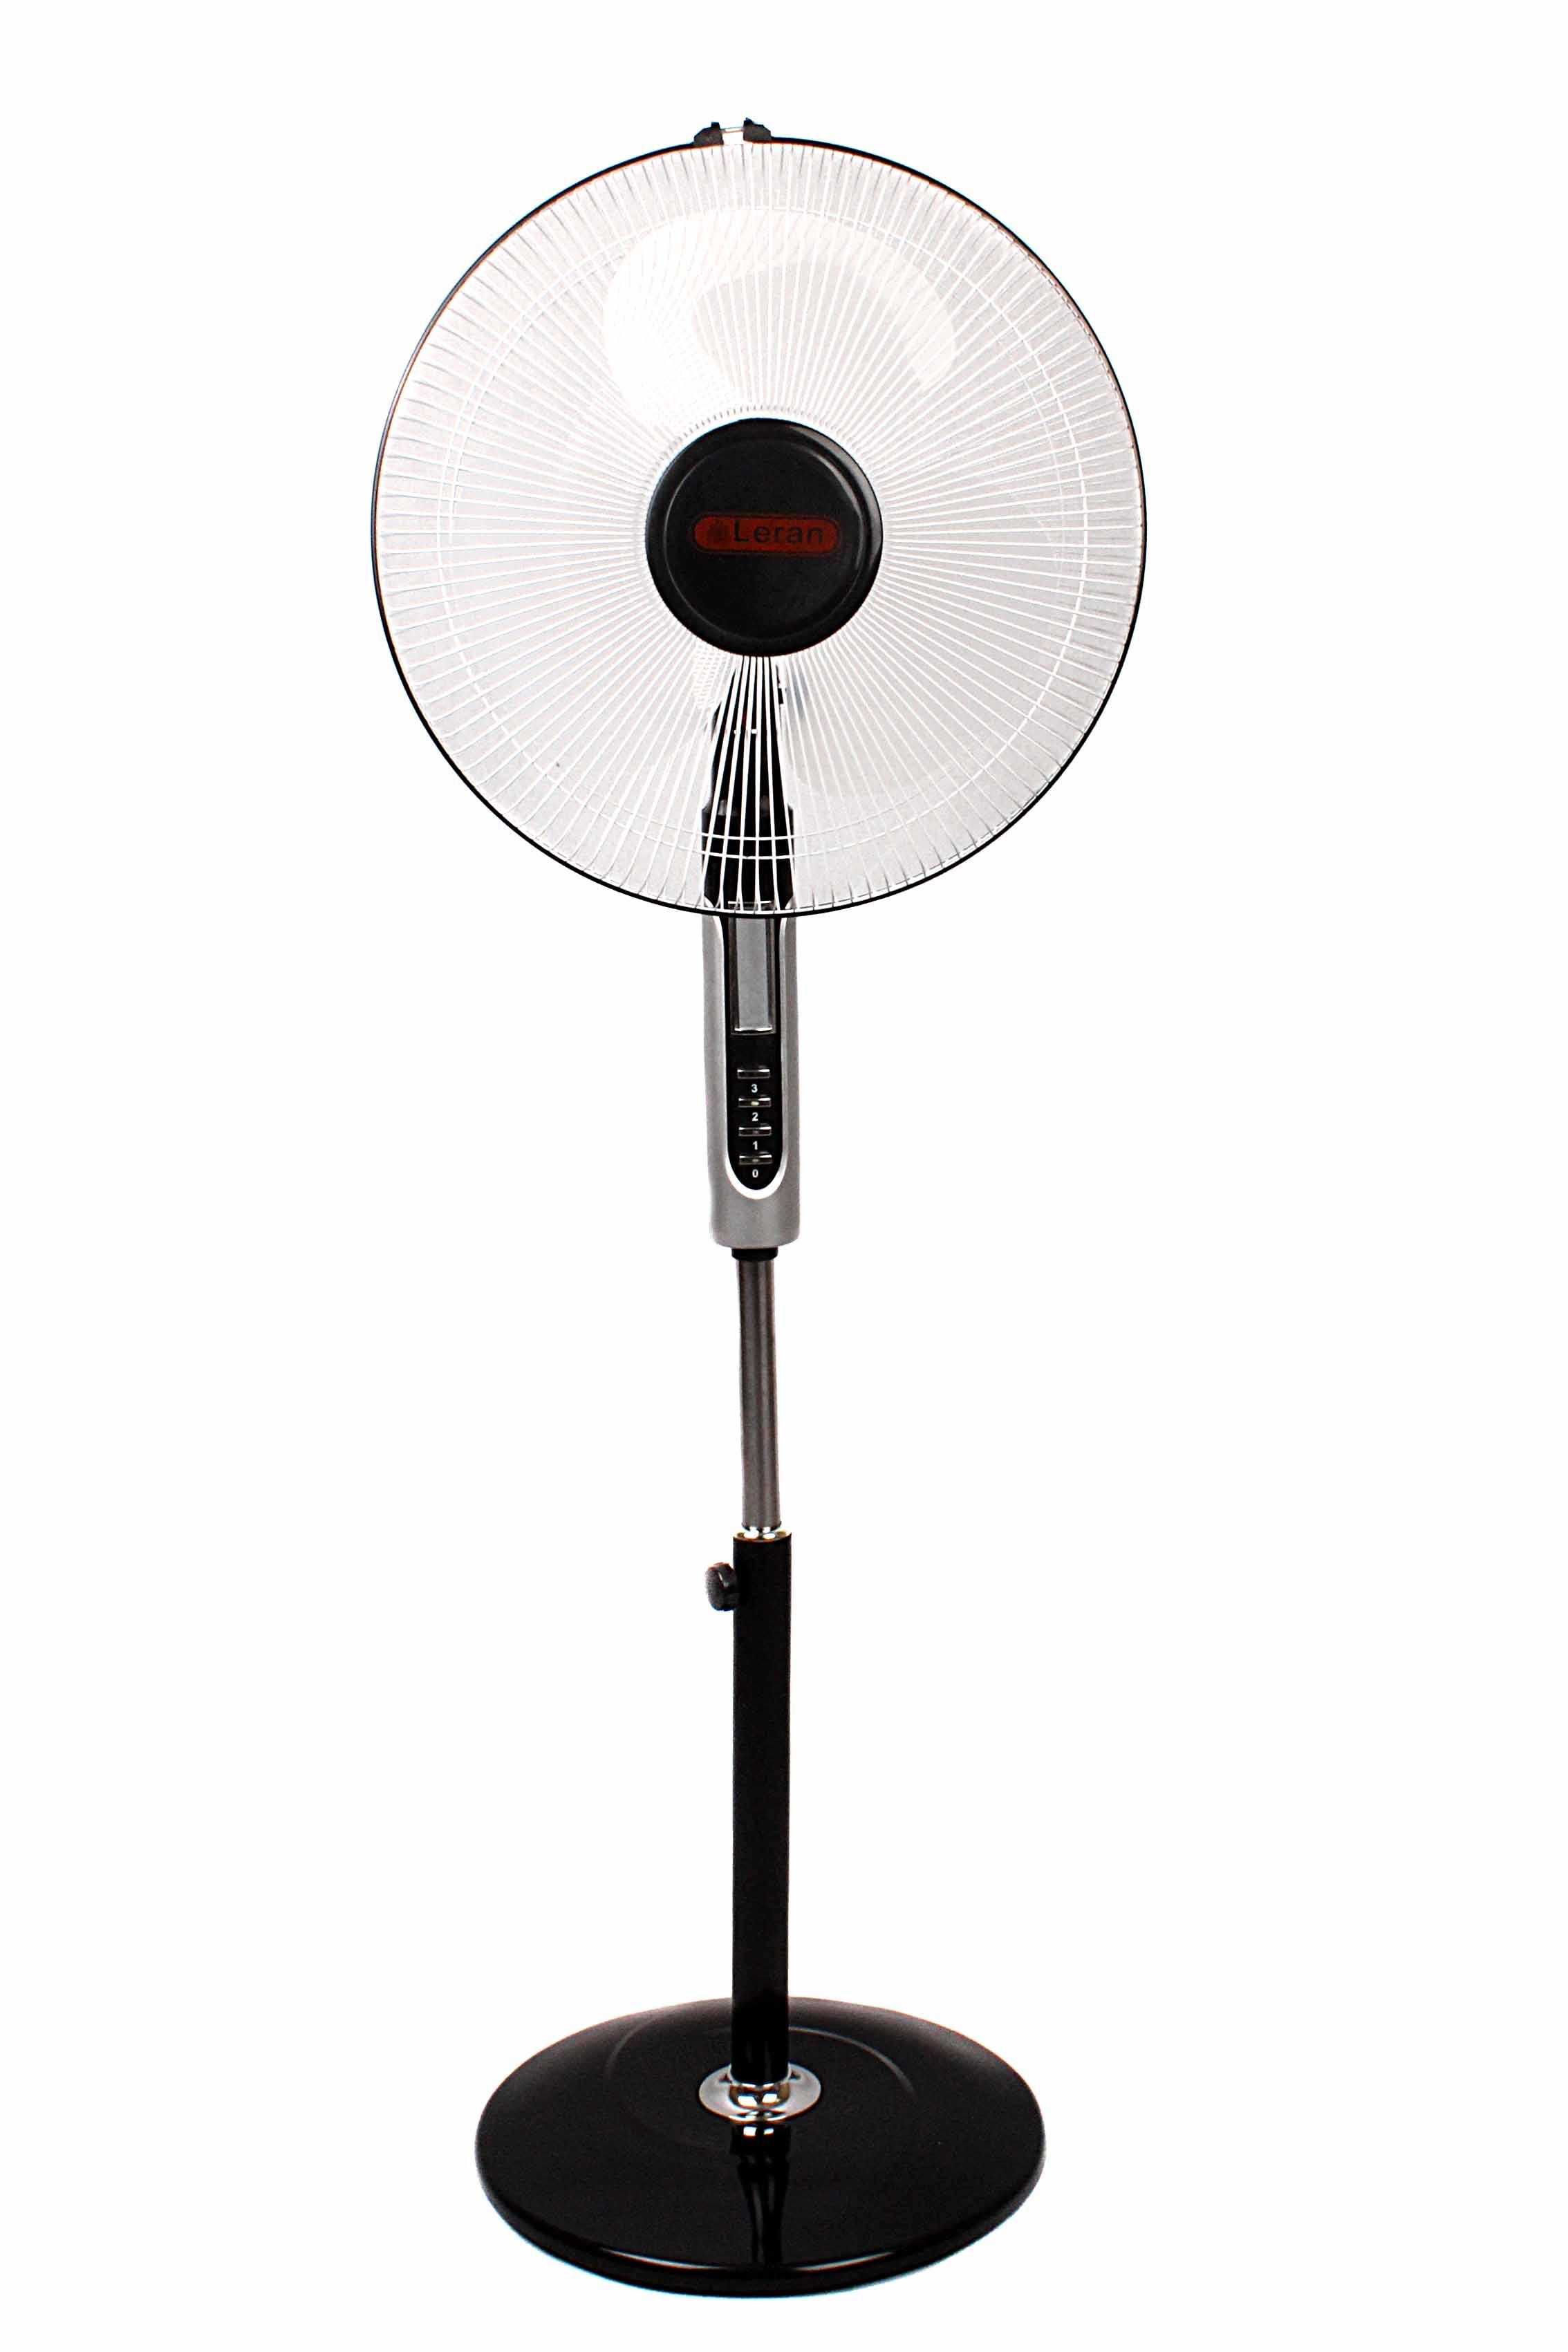 Вентилятор Leran Real Brand Technics 849.000